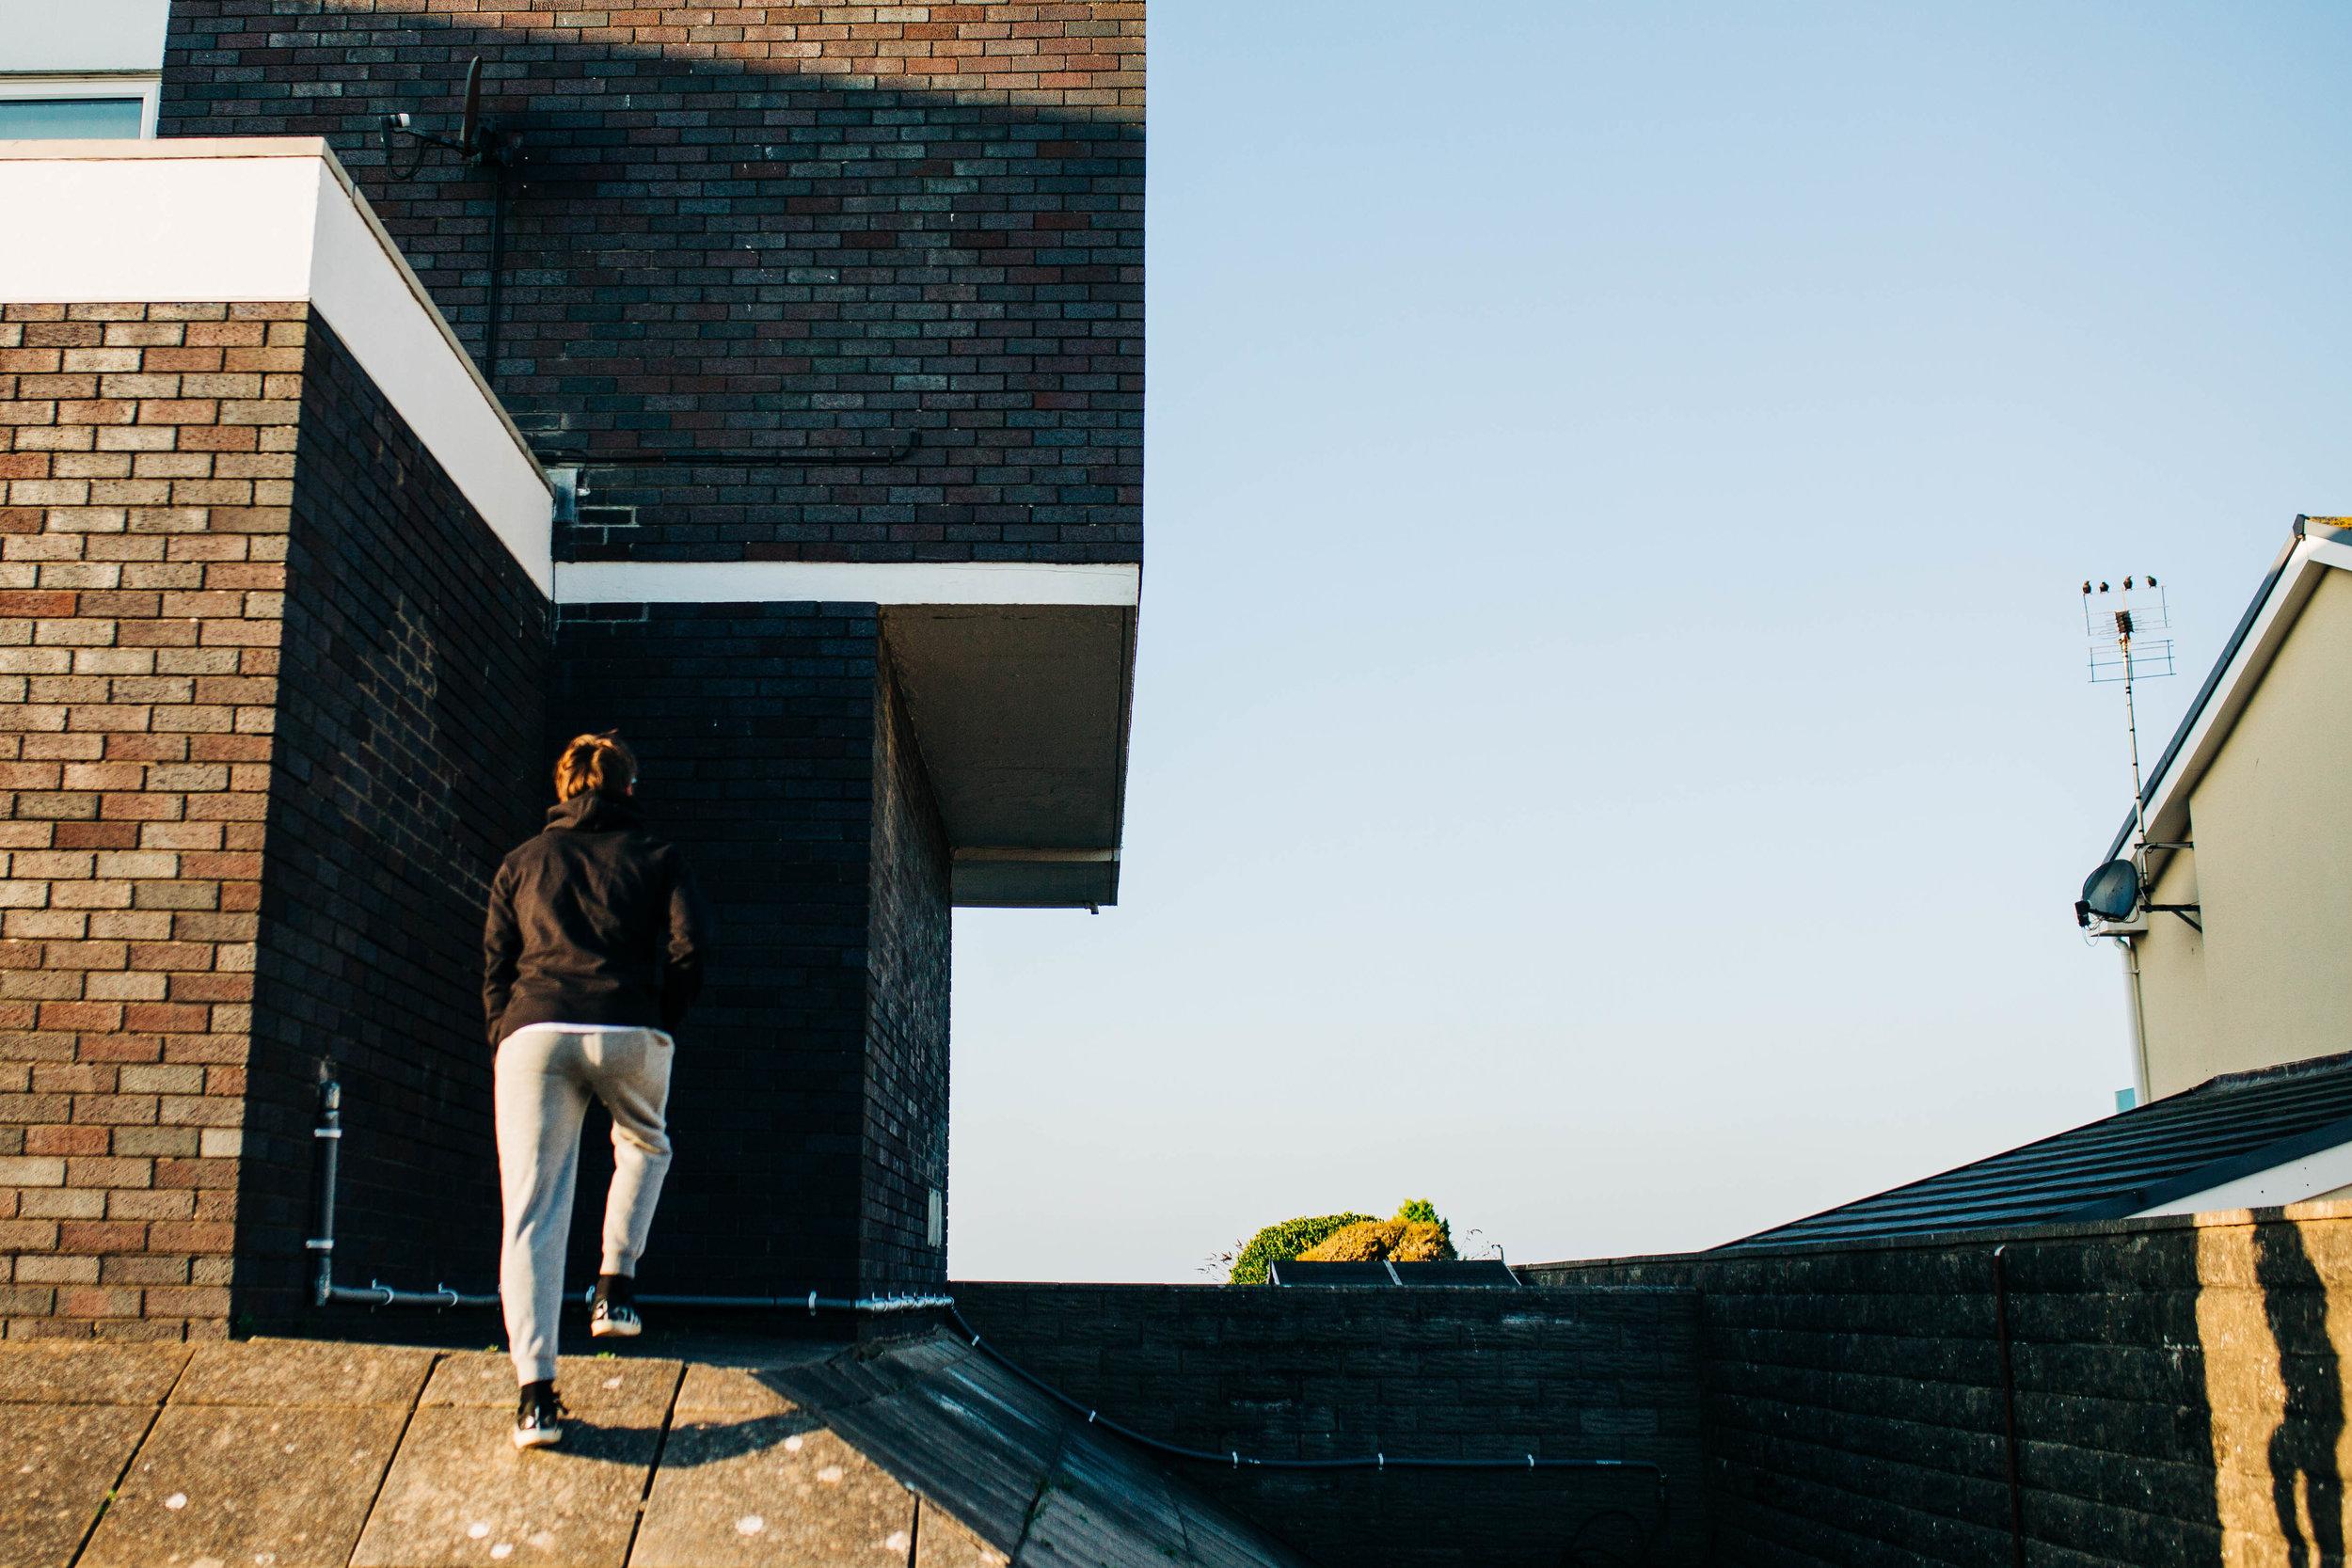 Alex_Sedgmond_Photography-Cardiff-SouthWales-PorthcawlRestbay-Surfing-EzraHames-2.jpg